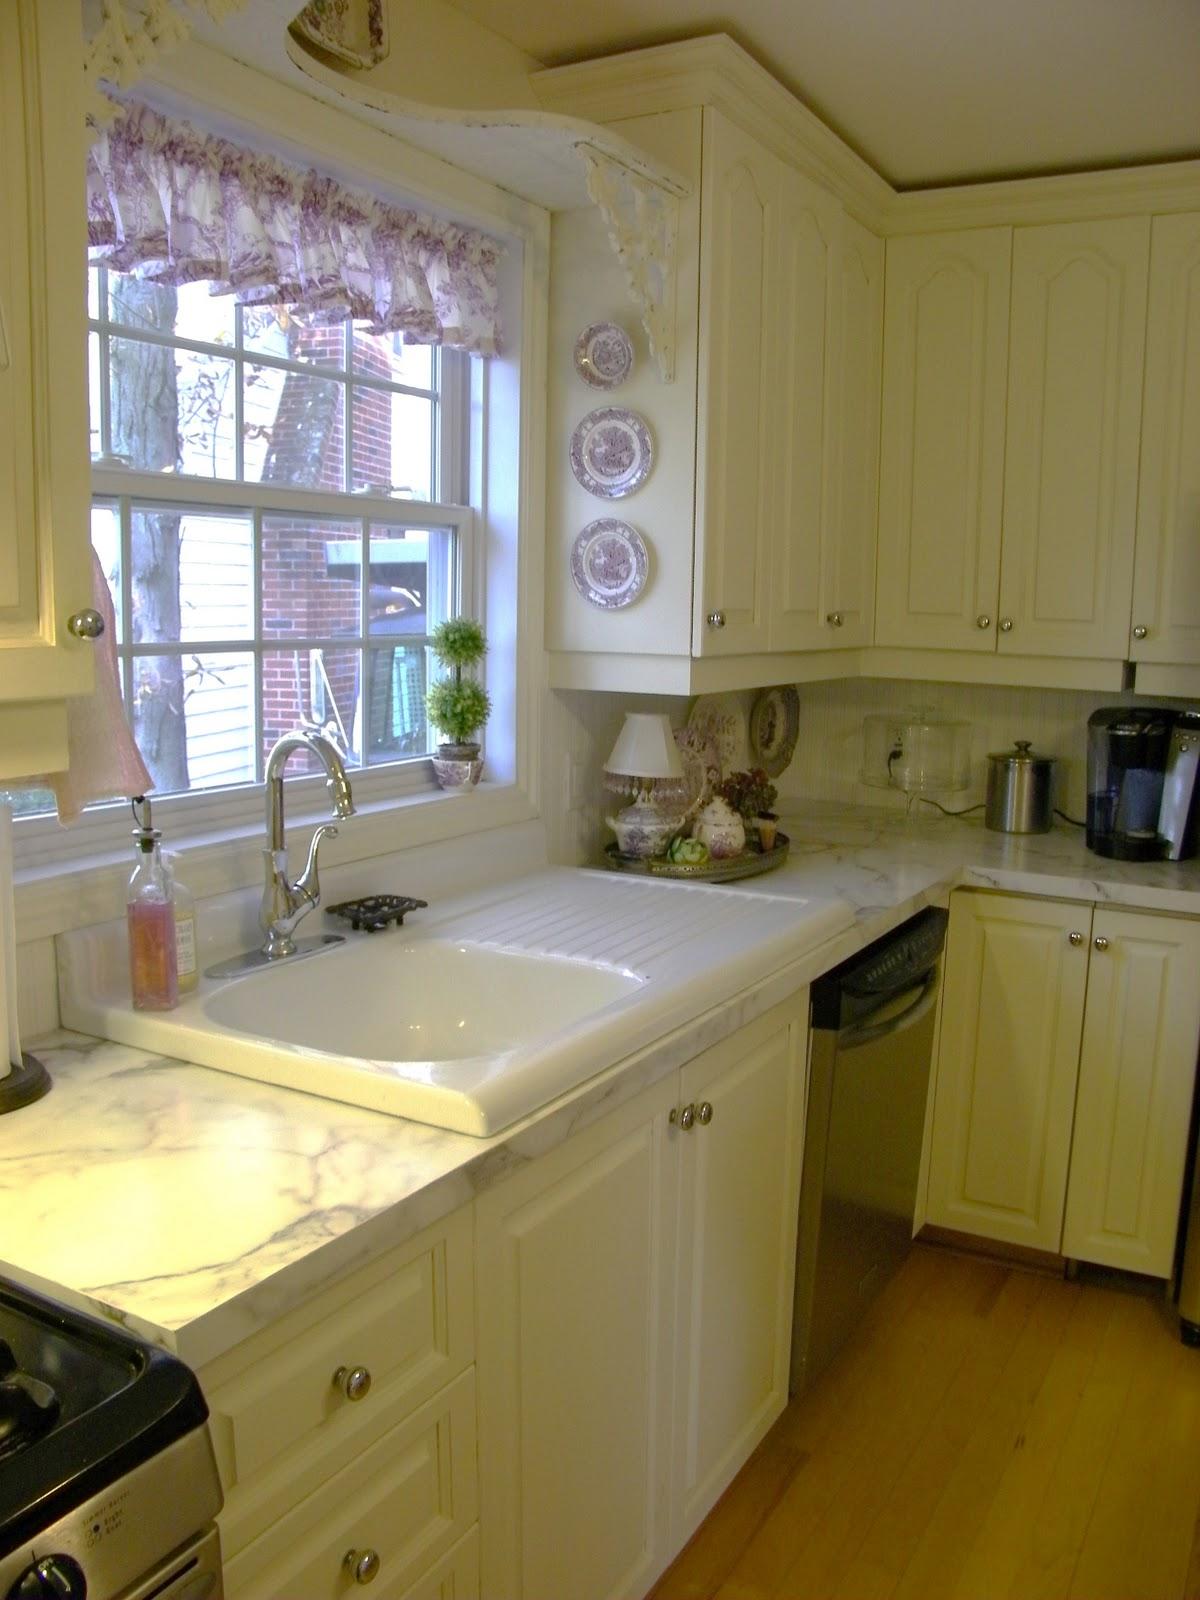 Retrofit Farmhouse Sink : retrofit farmhouse farmhouse sinks farmhouse kitchen 7 jpg 1200 1200 ...